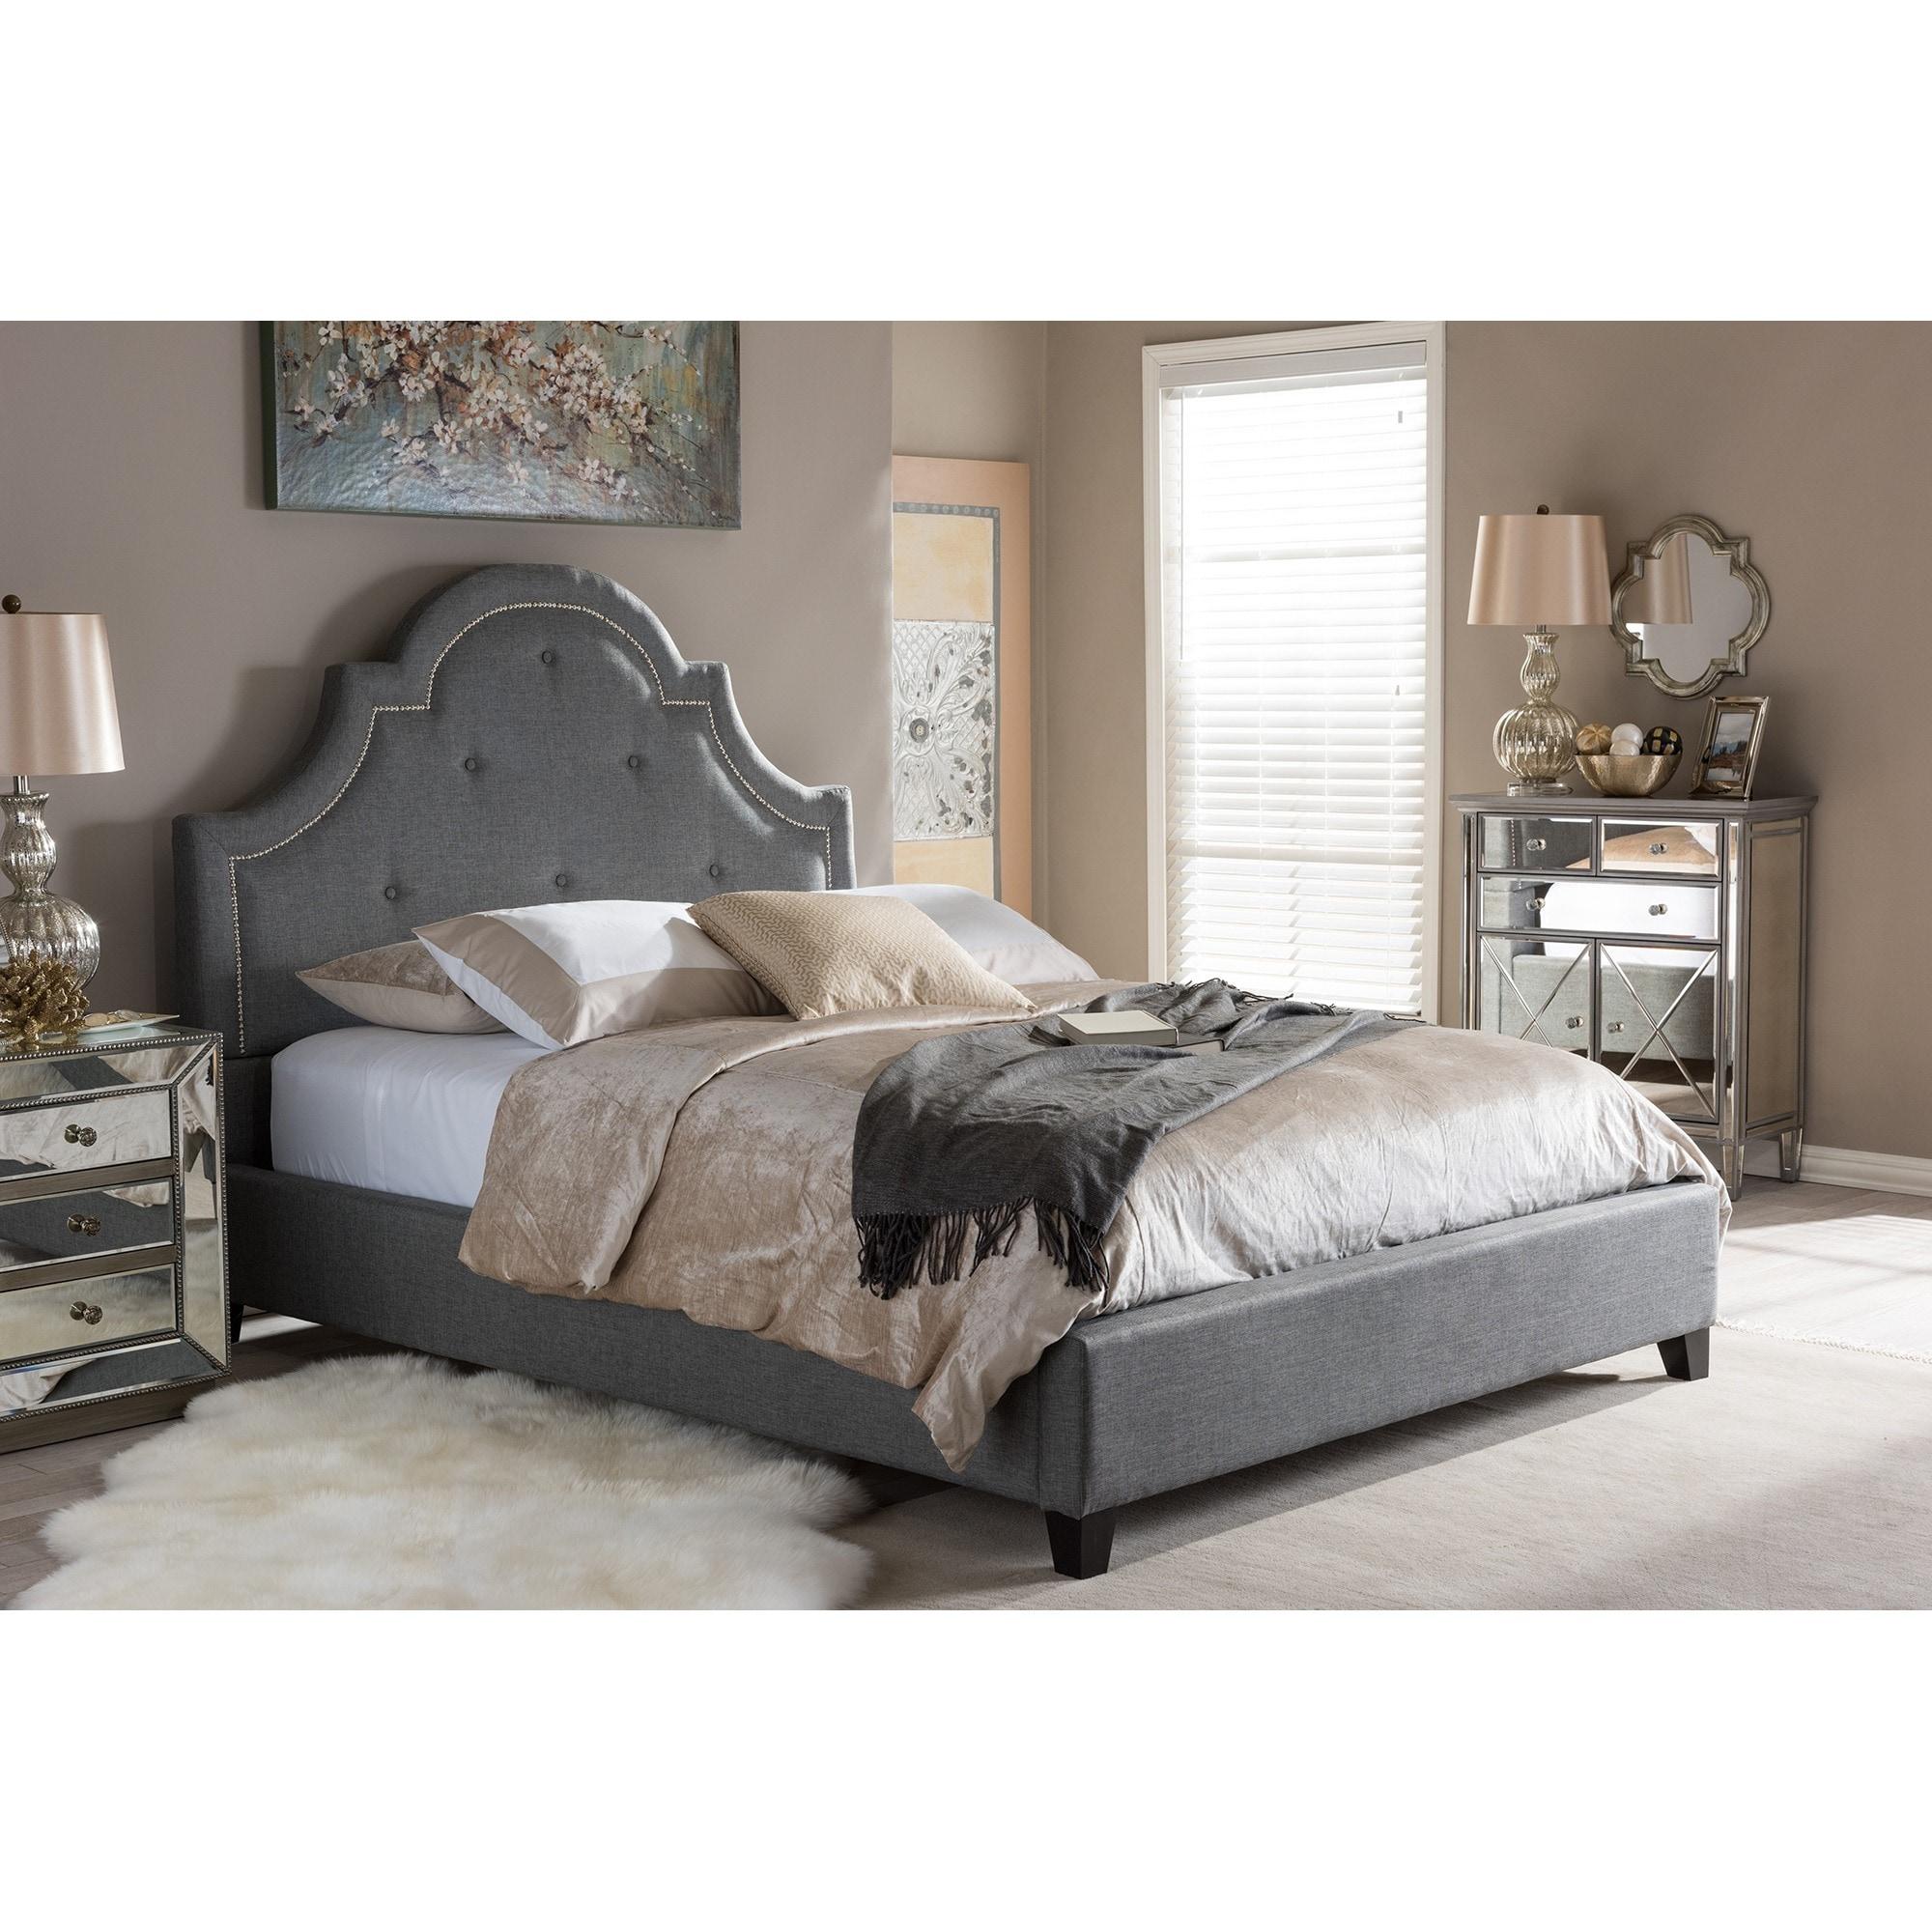 . Silver Orchid Gael Grey Linen Modern Platform Bed  King Size